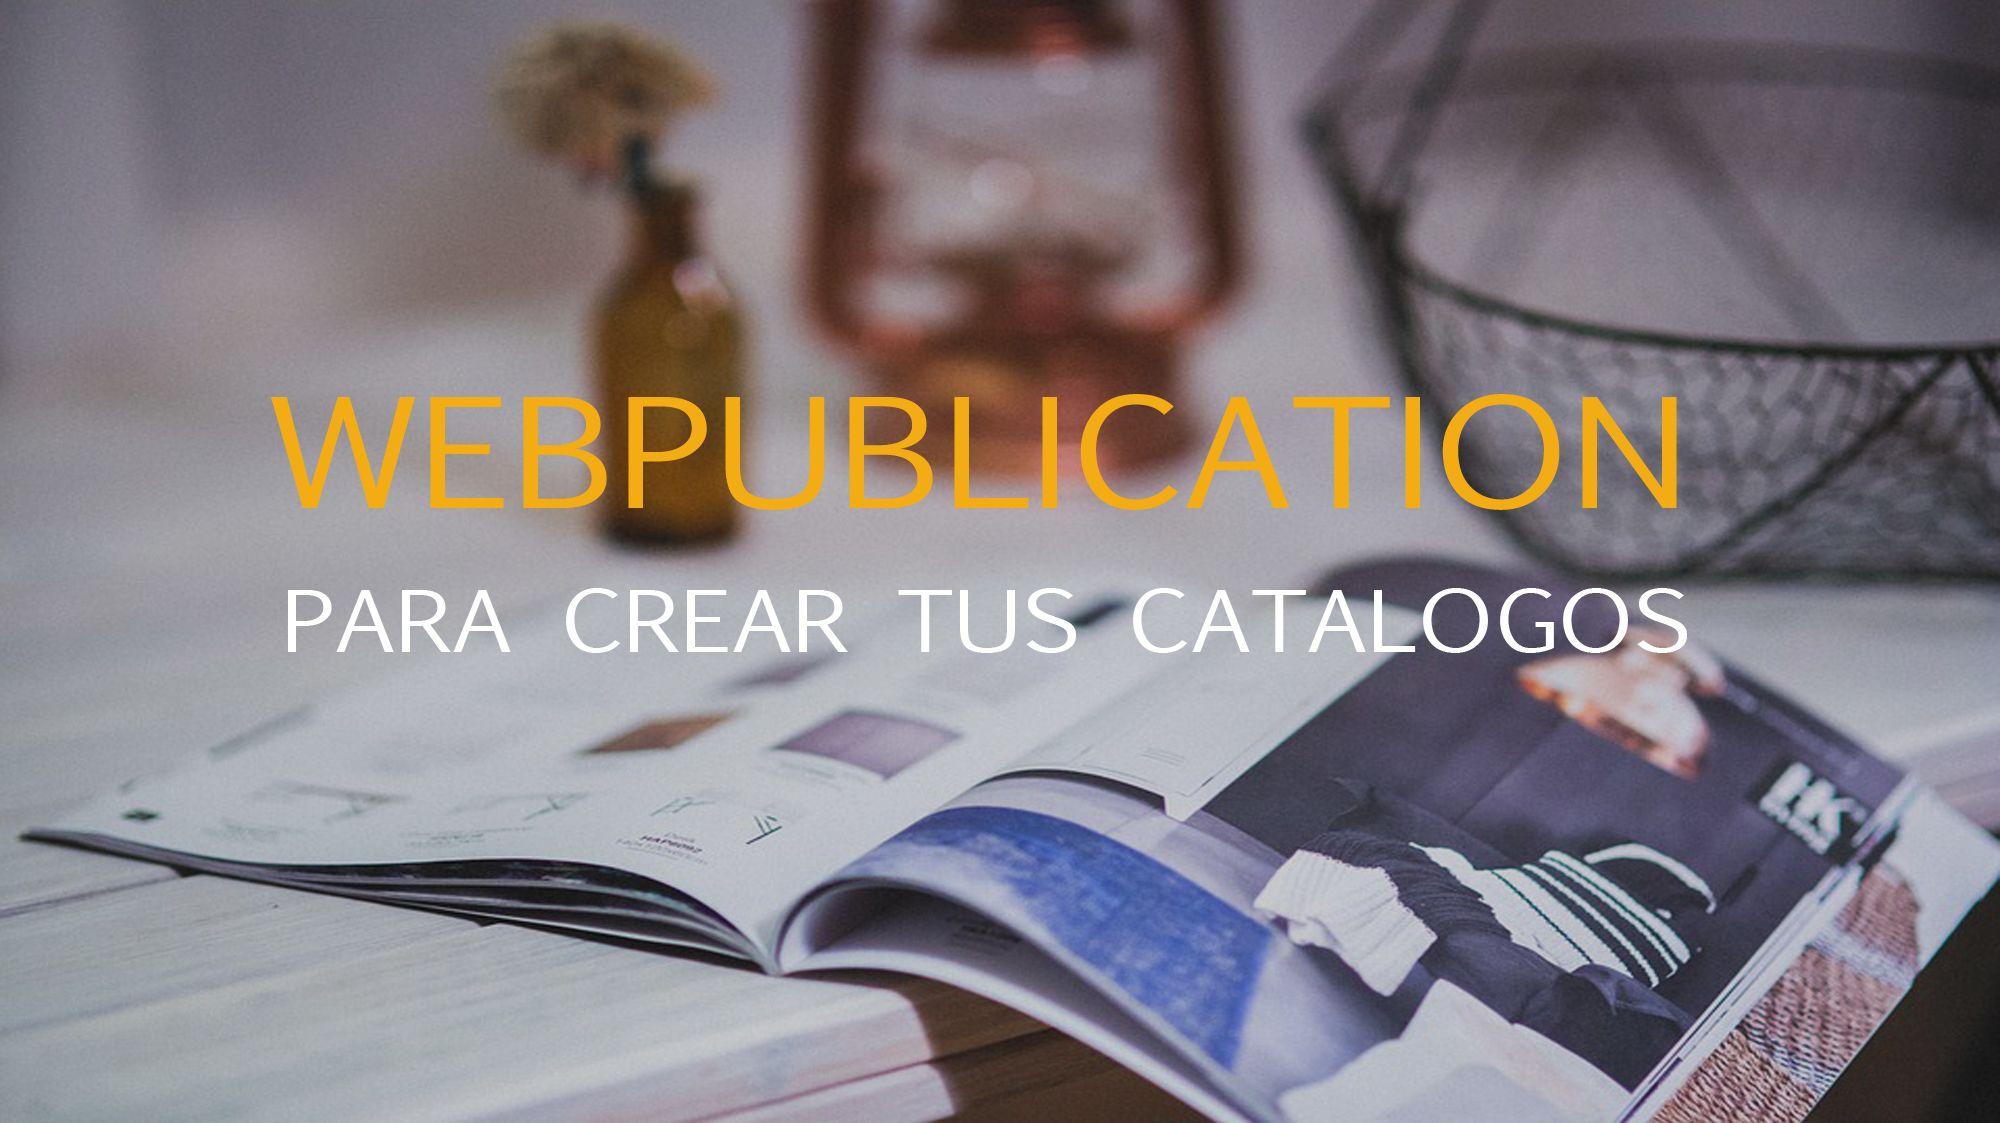 WEBPUBLICATION